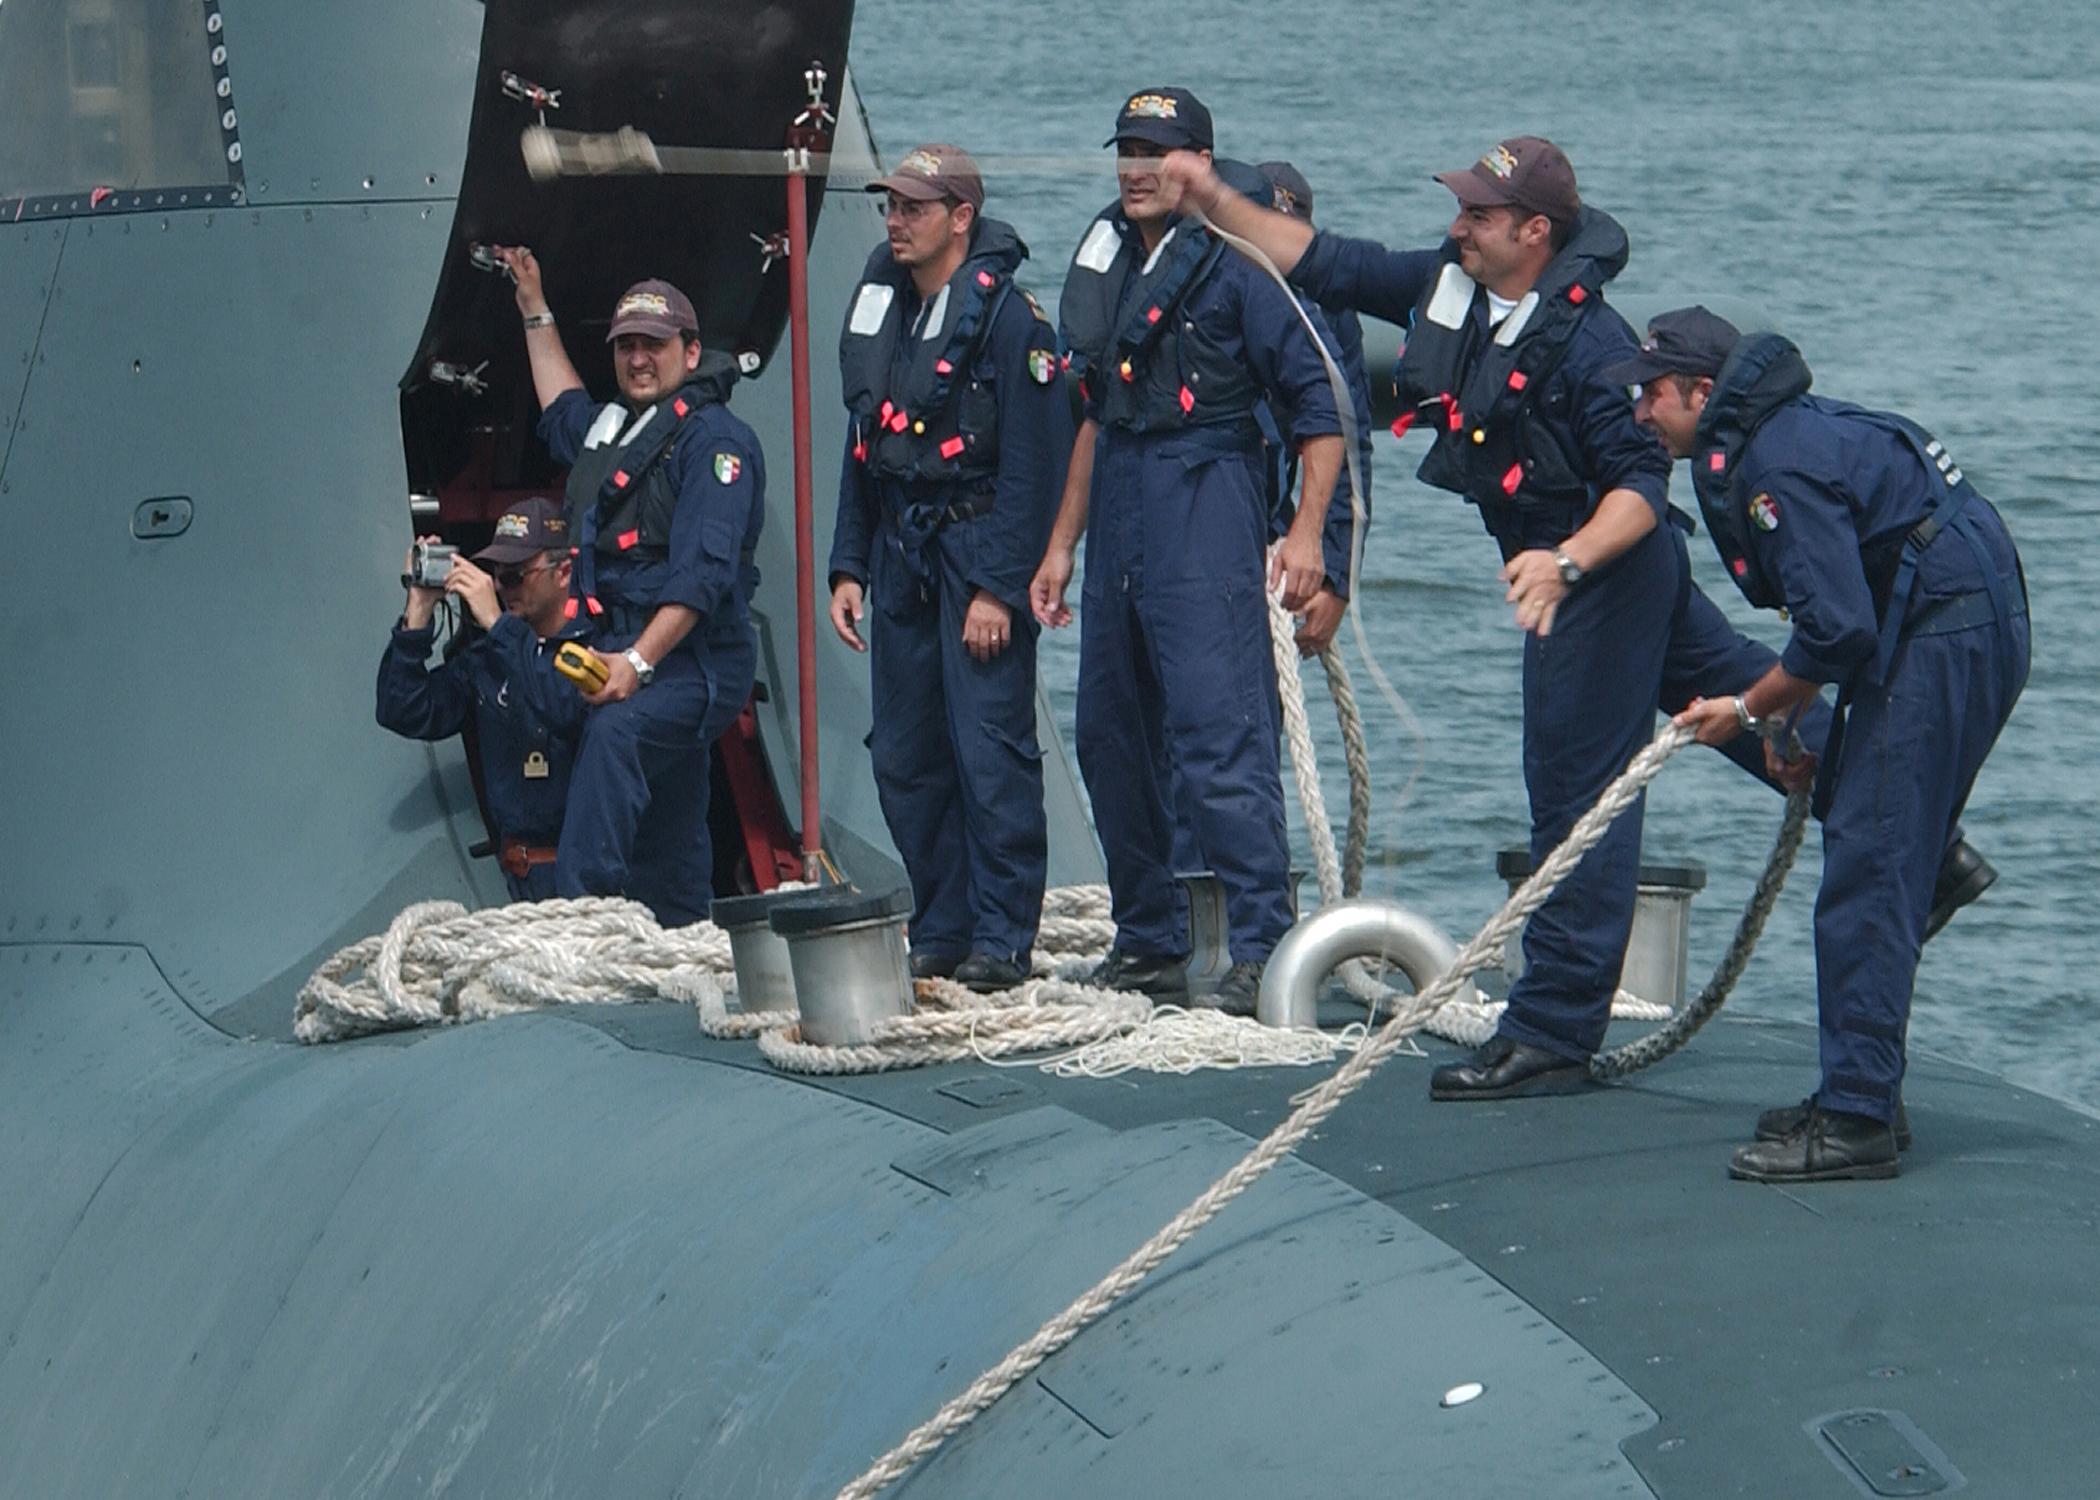 File:US Navy 080711-N-3285B-034 Crew members from the